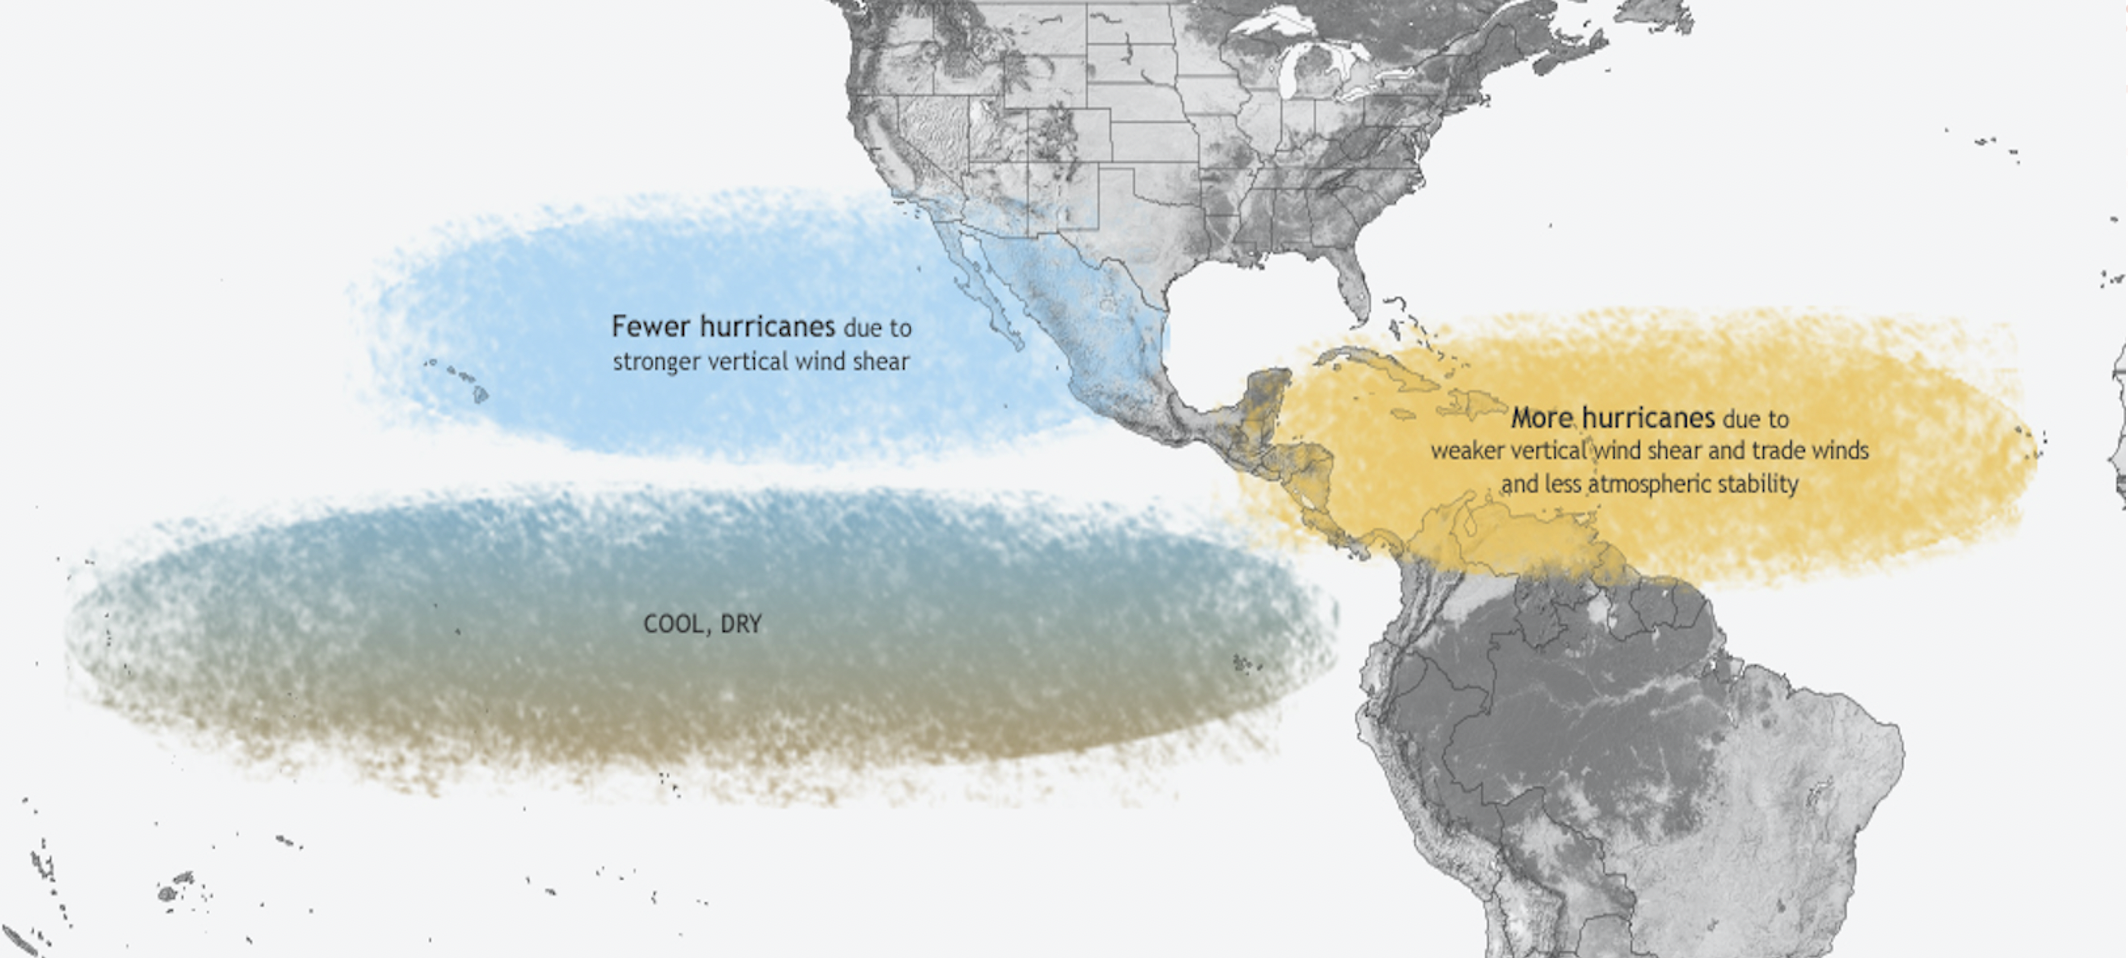 The effects of La Nina on the Atlantic Hurricane Season: Low wind shear supports storm development